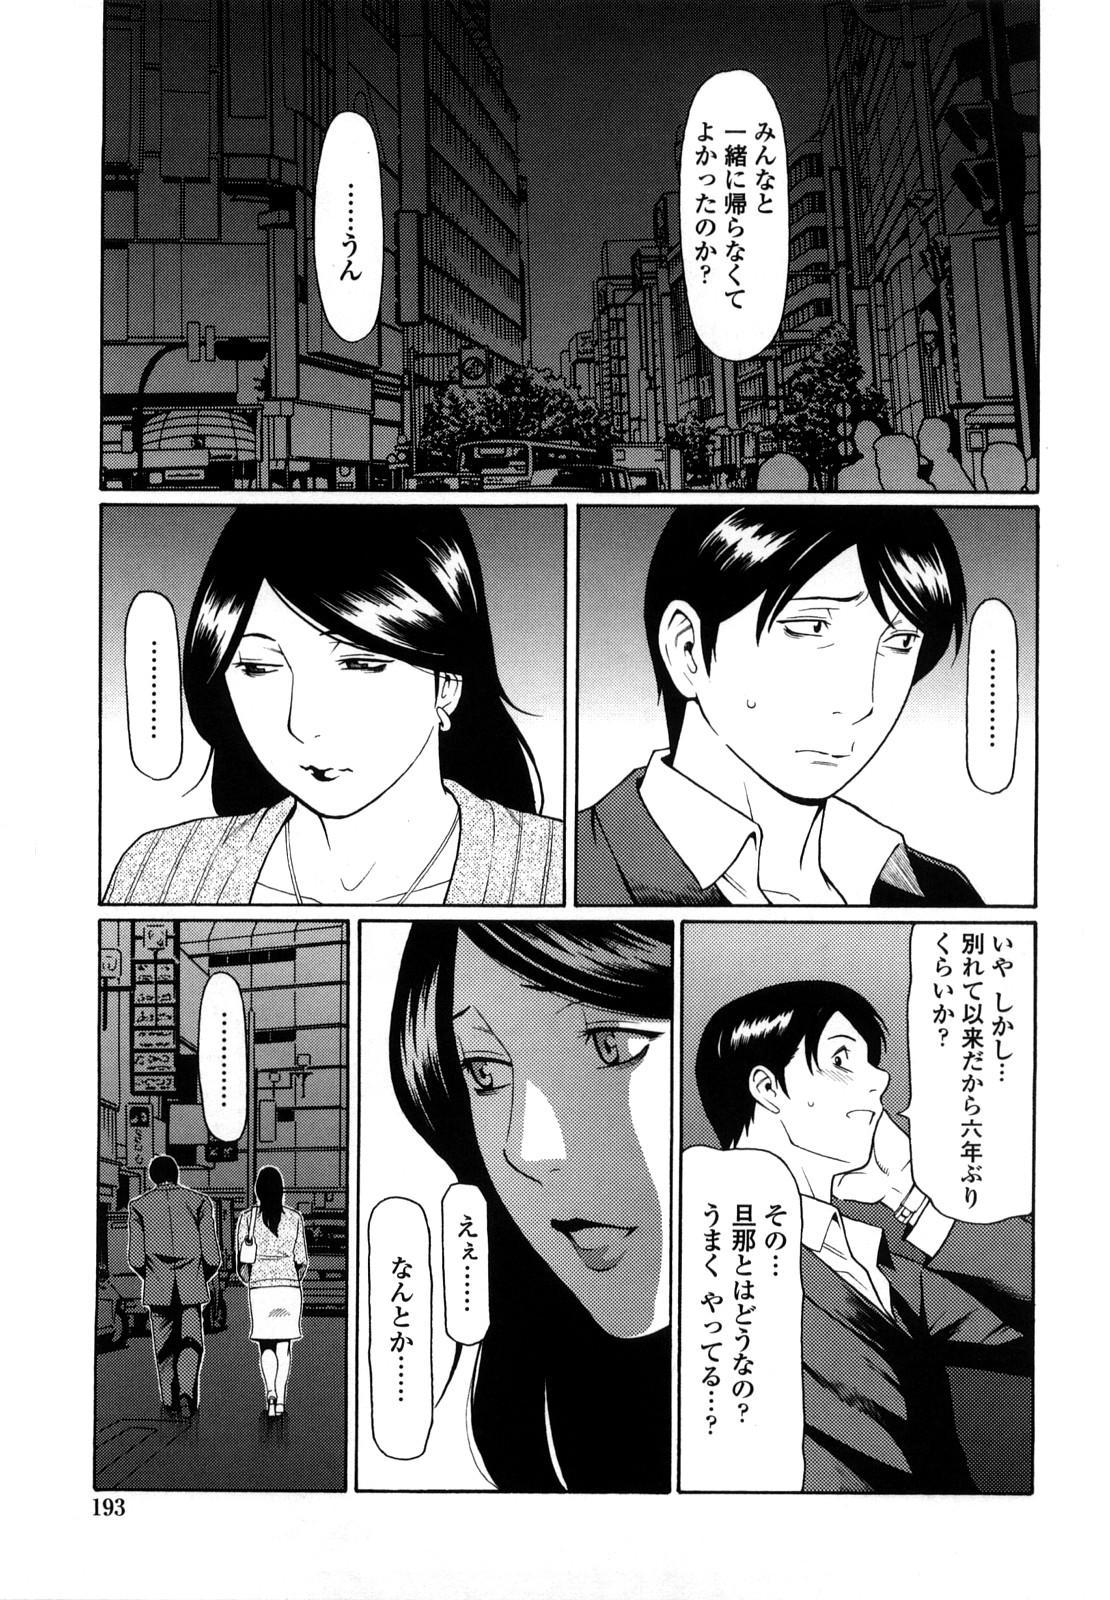 [Takasugi Kou] Kindan no Haha-Ana - Immorality Love-Hole [Decensored] 194